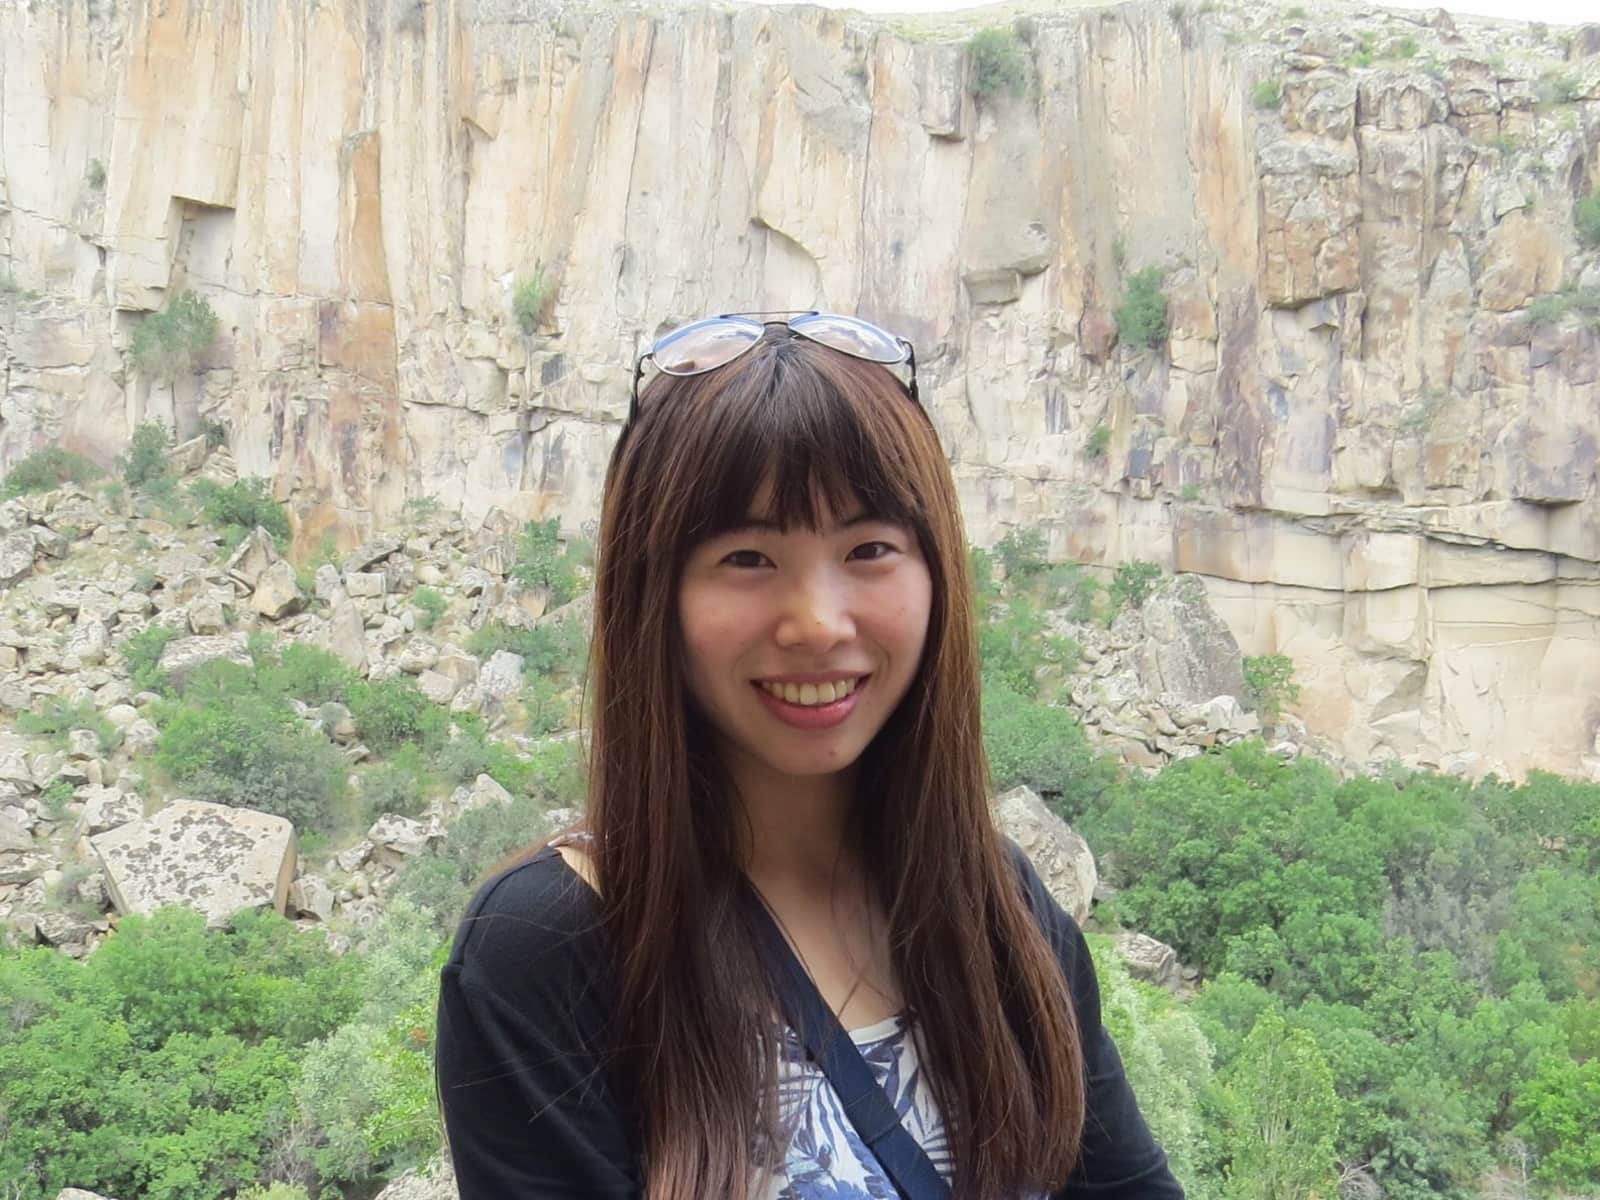 Yishen from Taoyuan City, Taiwan